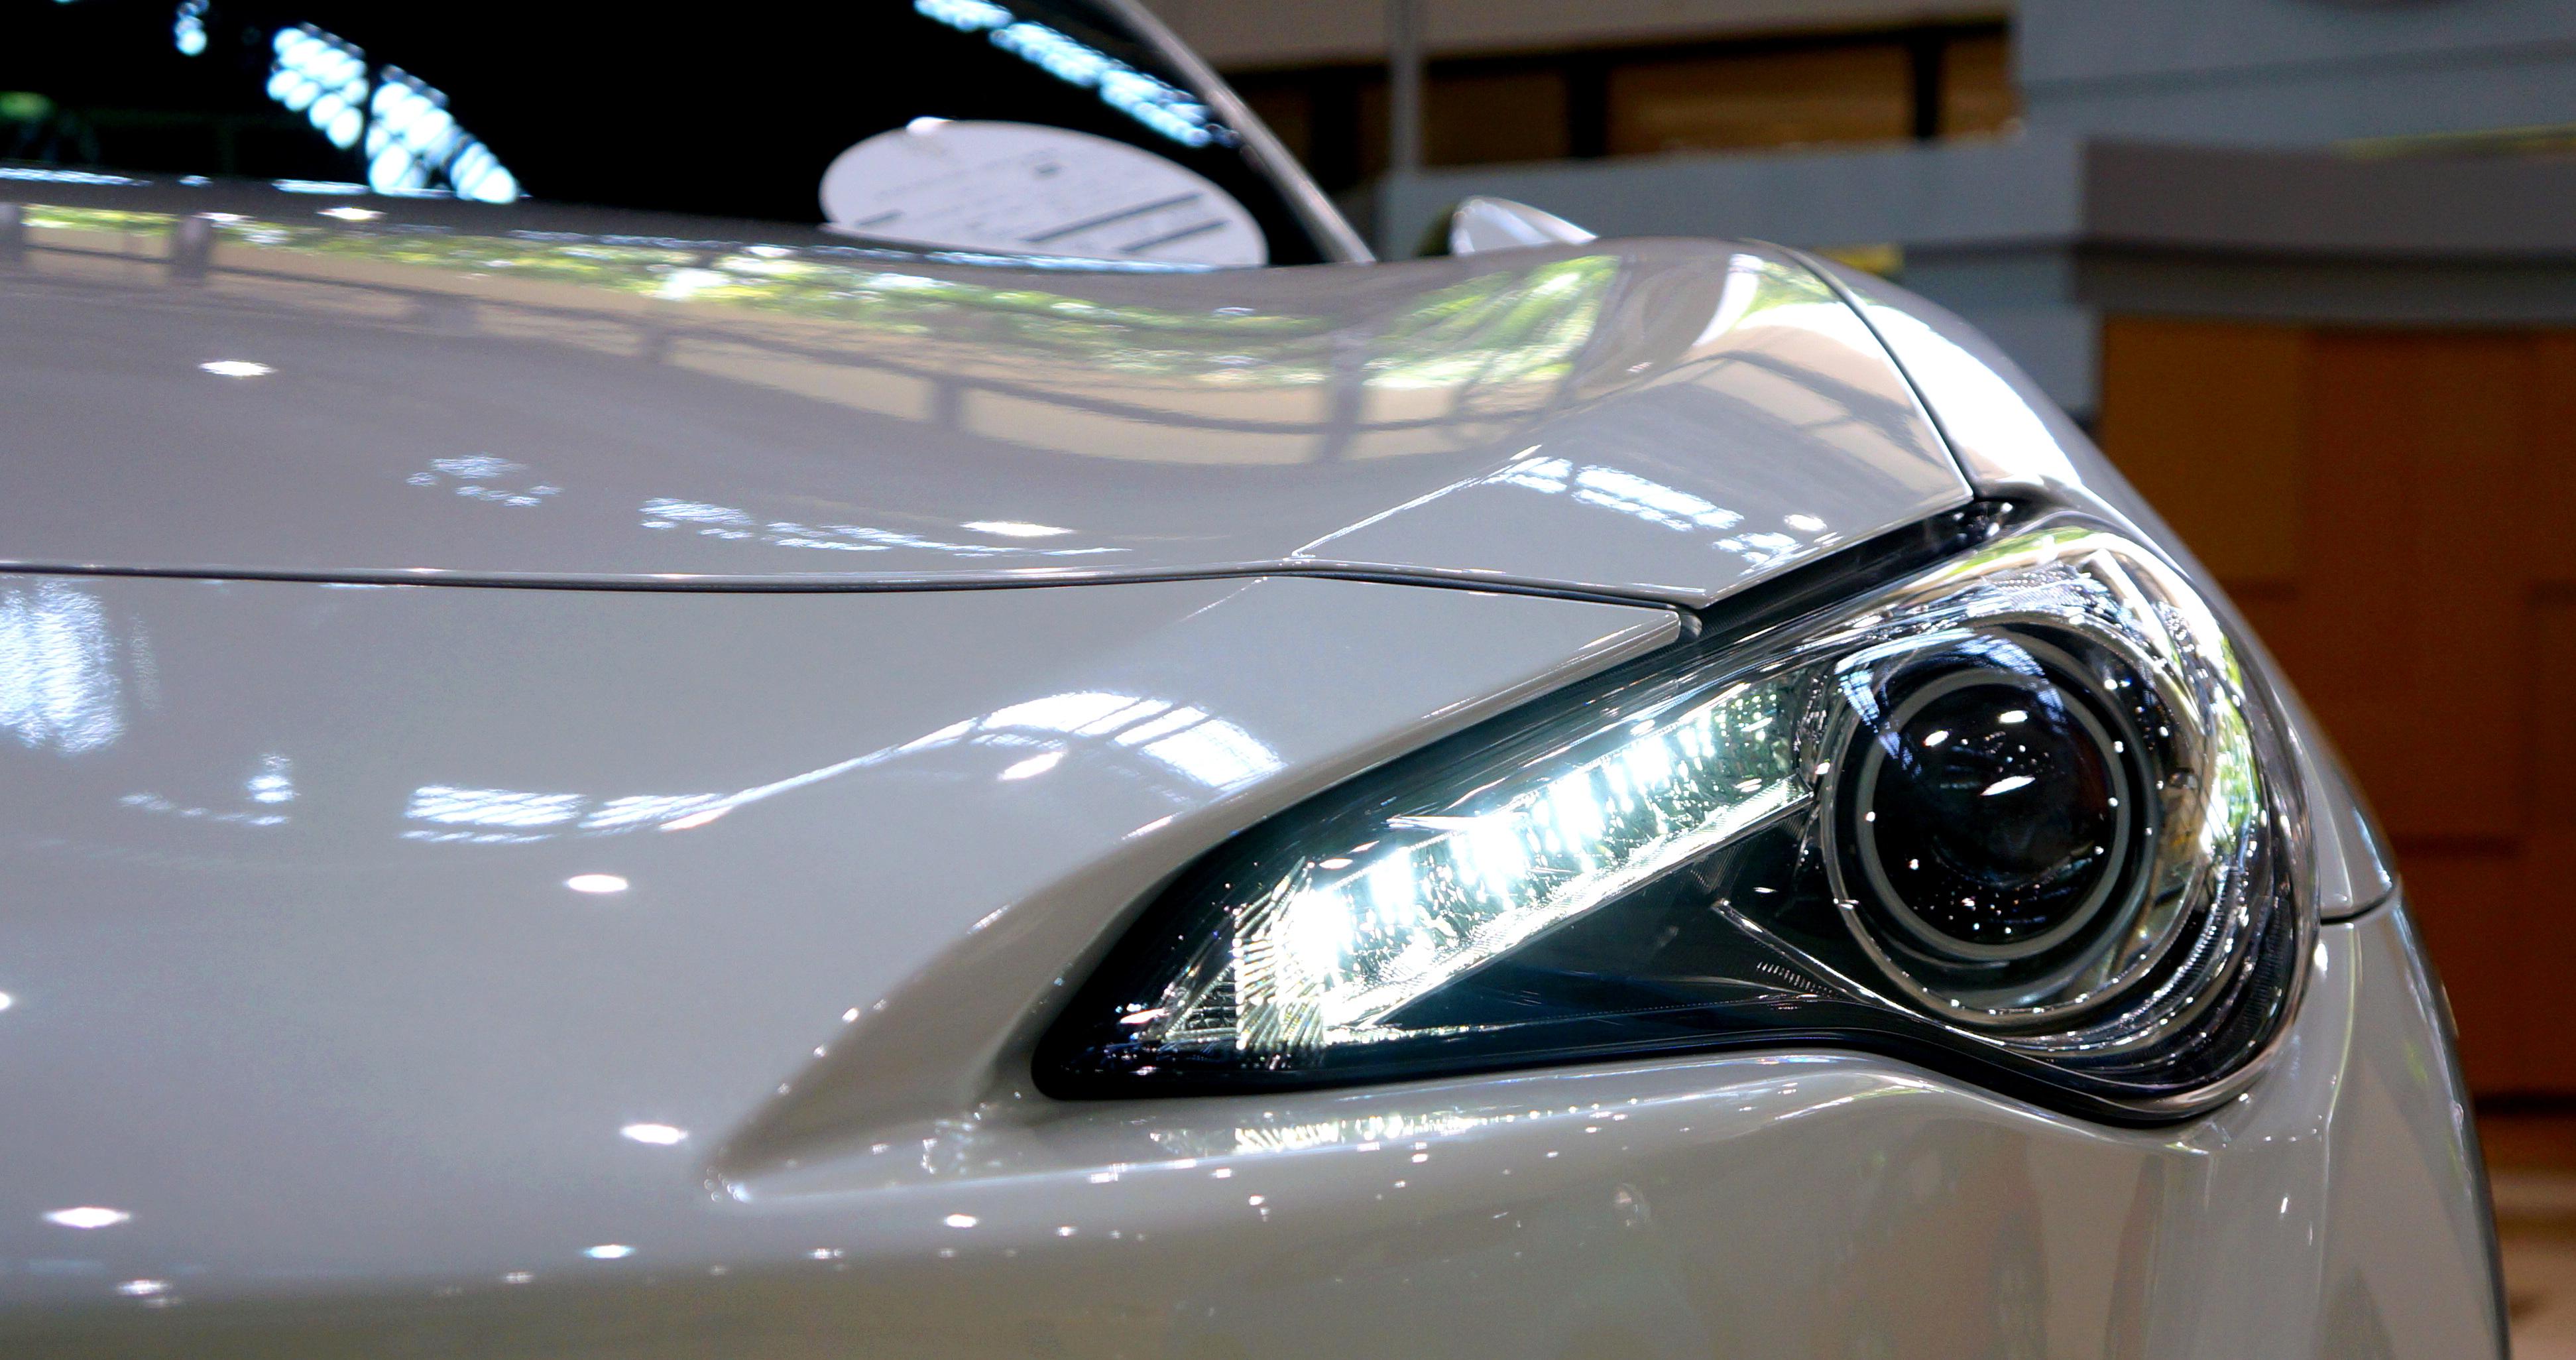 toyota 86 headlight by mikeymono on deviantart toyota headlight wiring